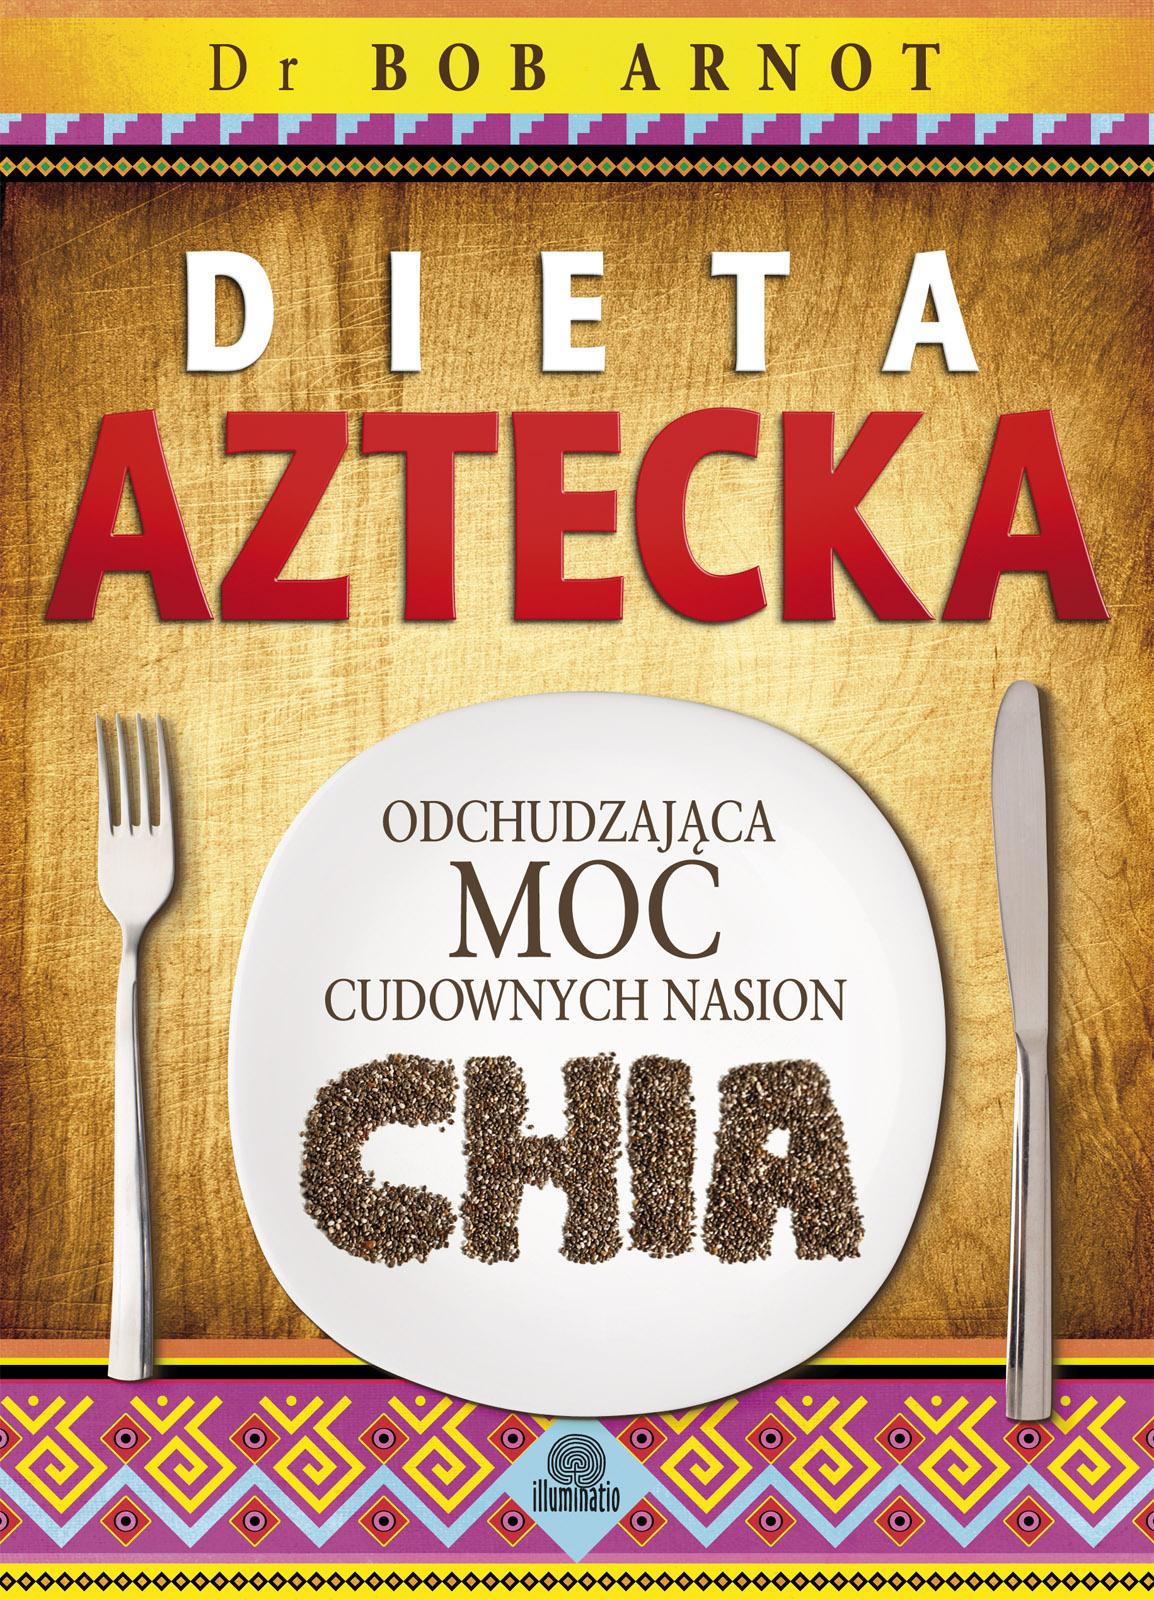 Dieta Aztecka